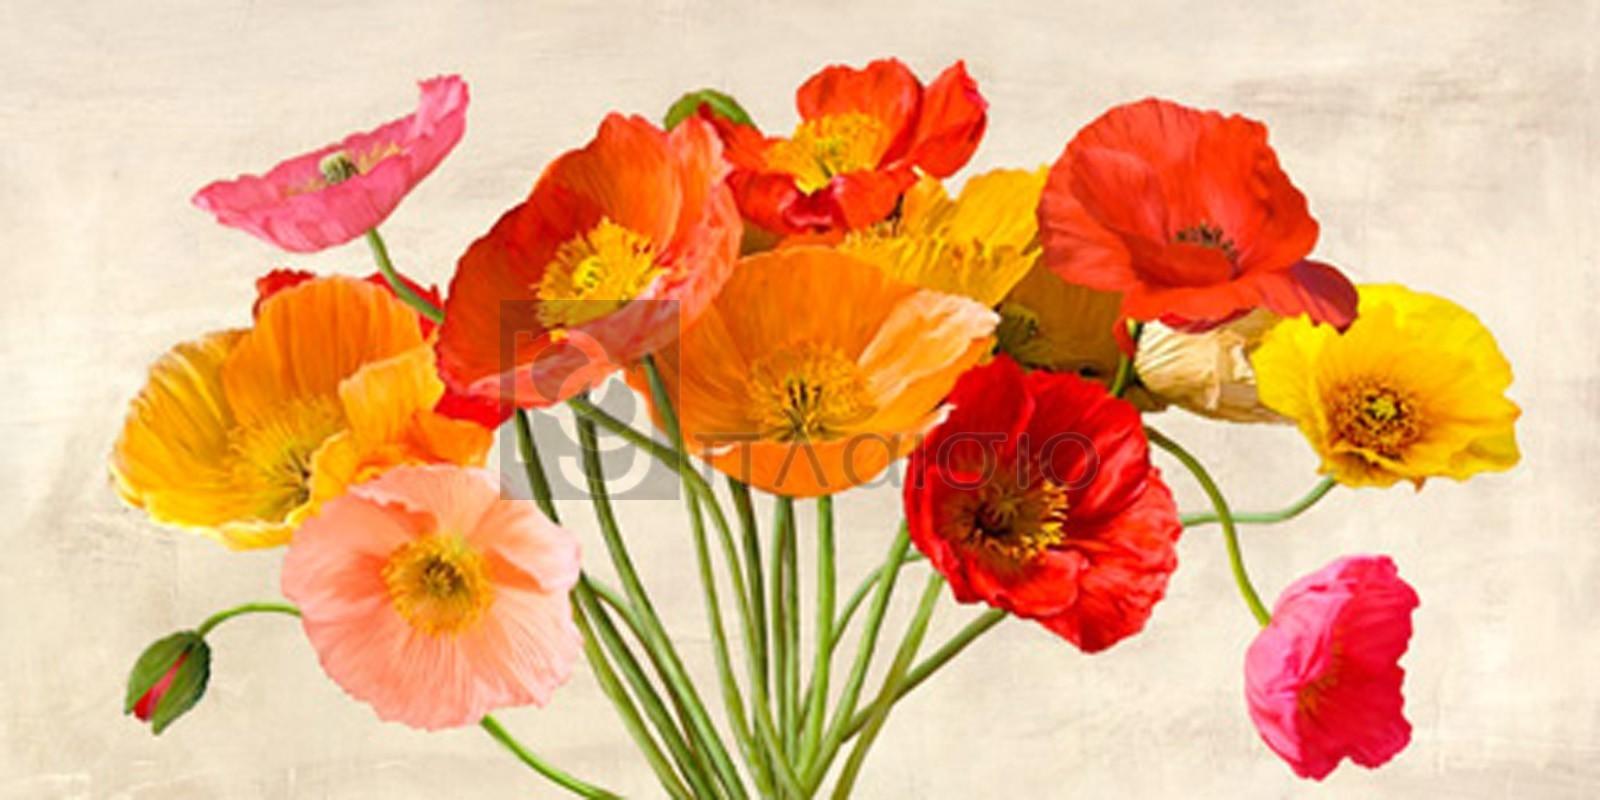 Luca Villa - Poppies in Spring